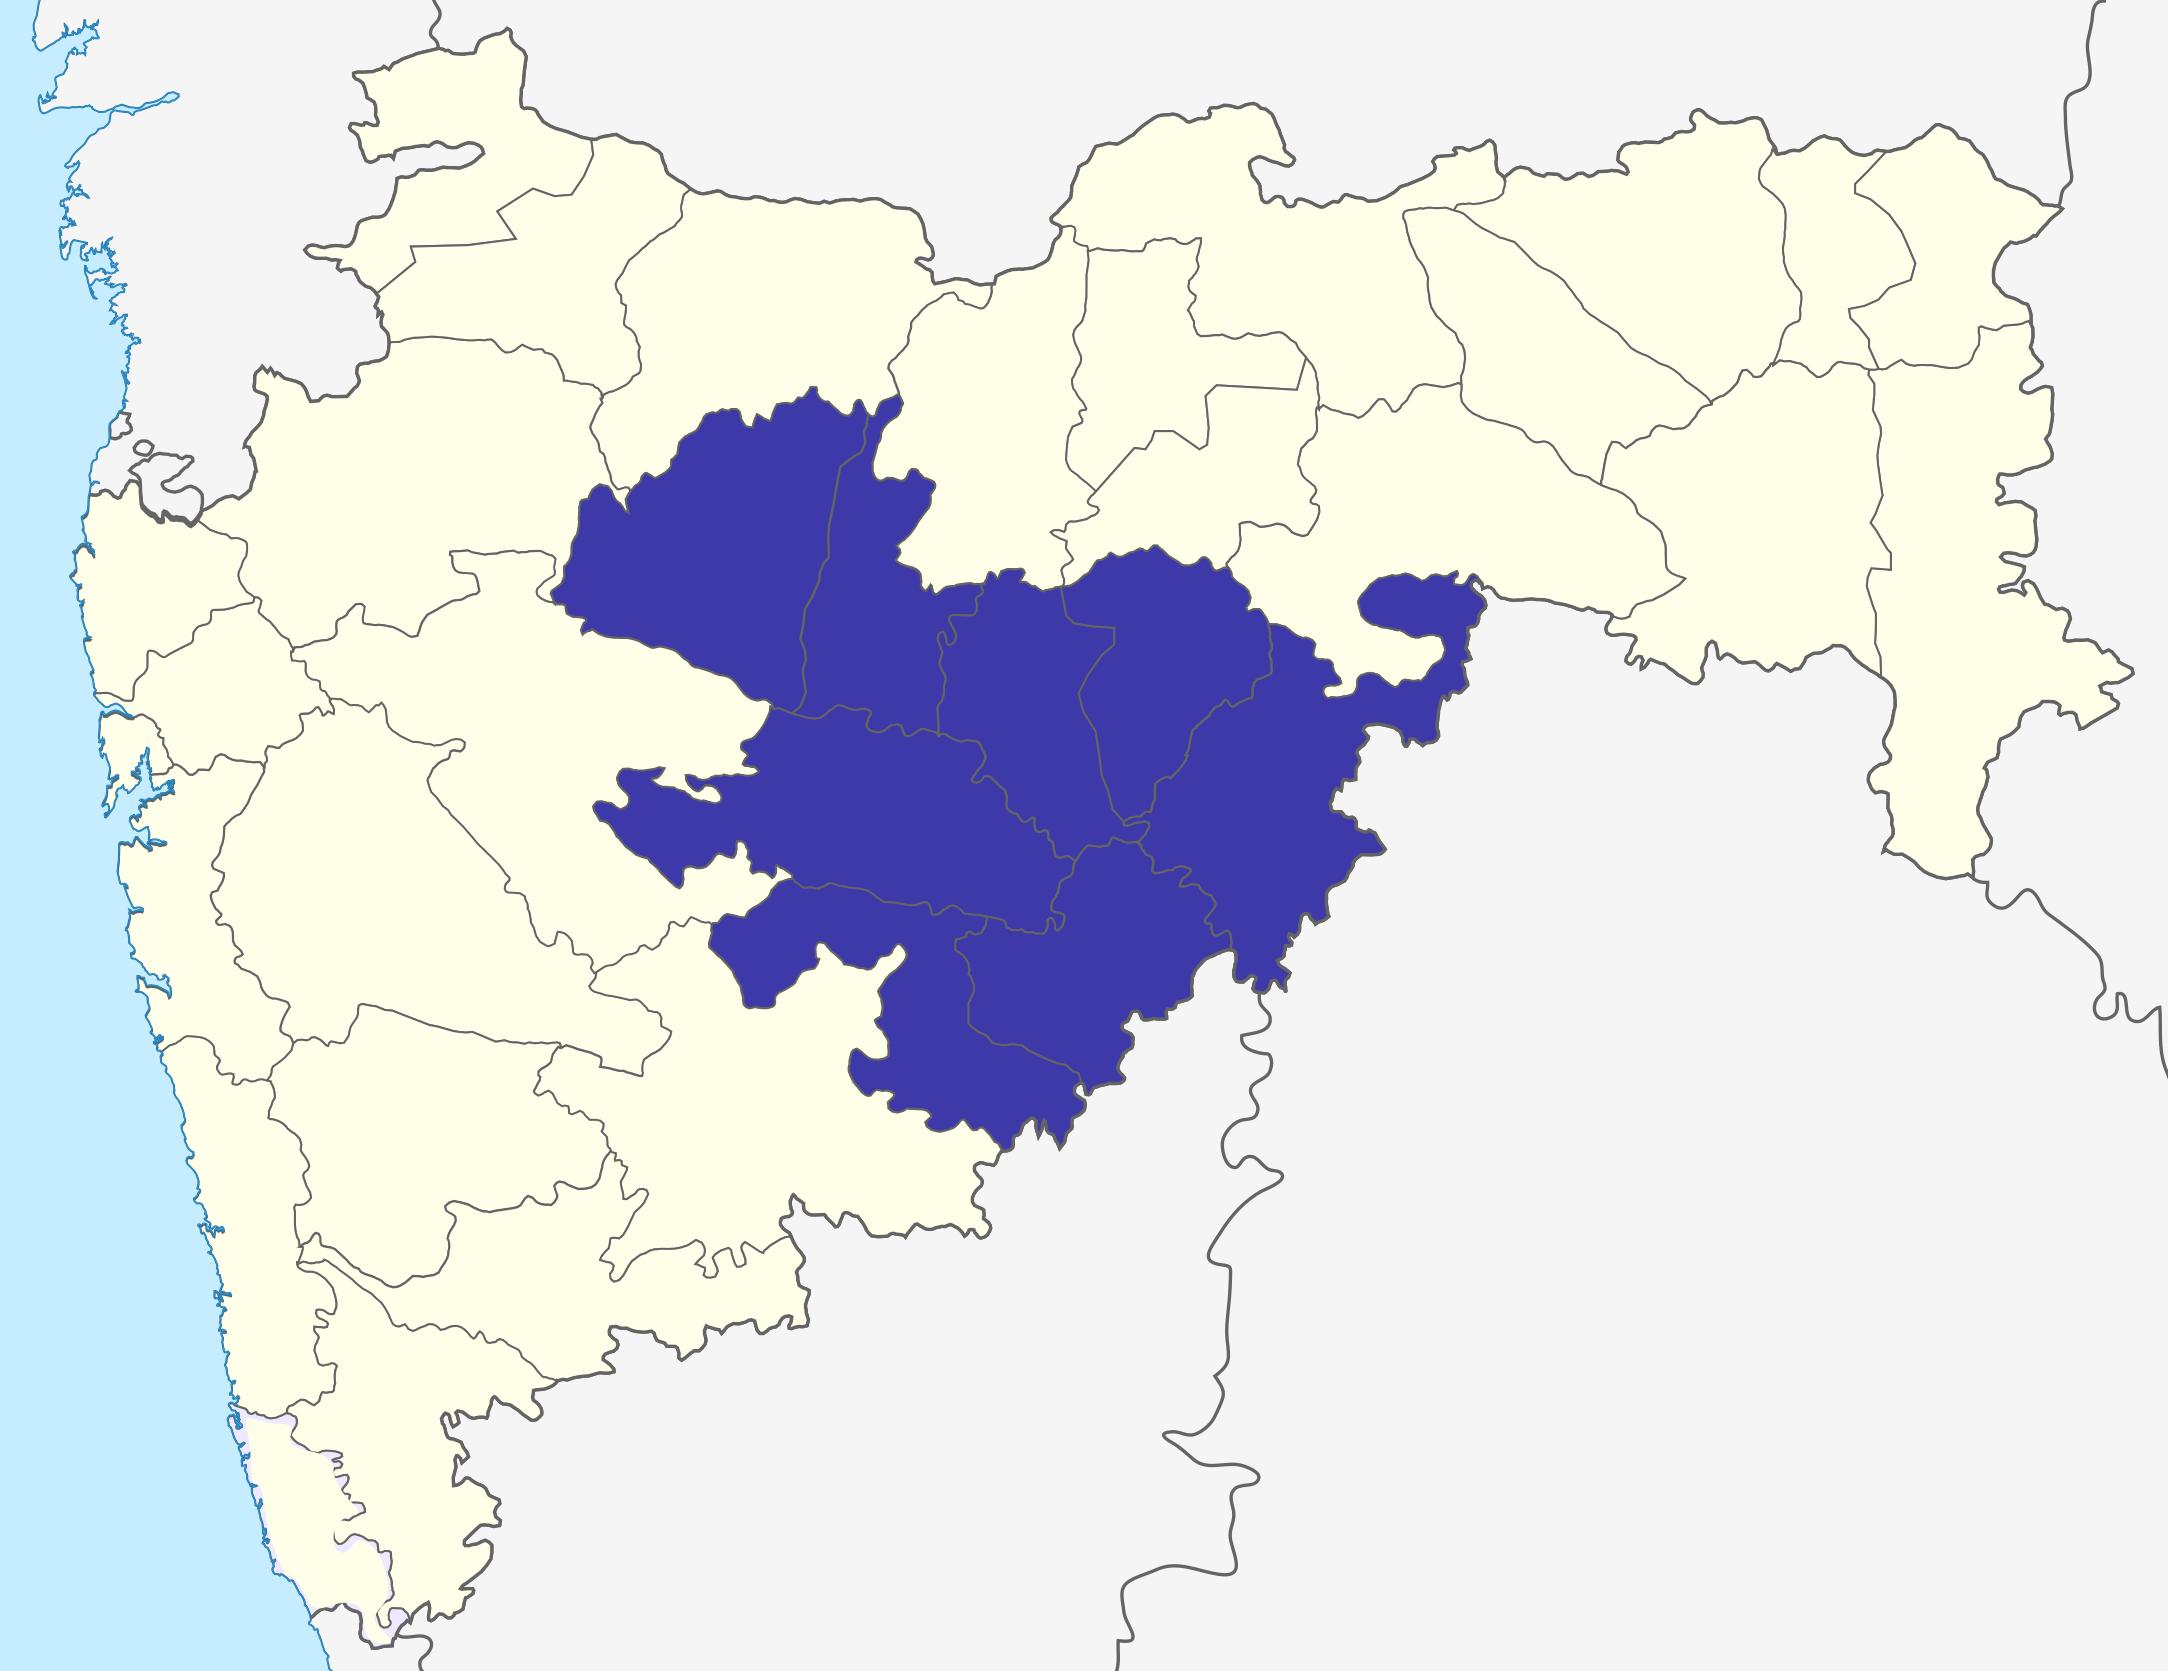 free download map of maharashtra